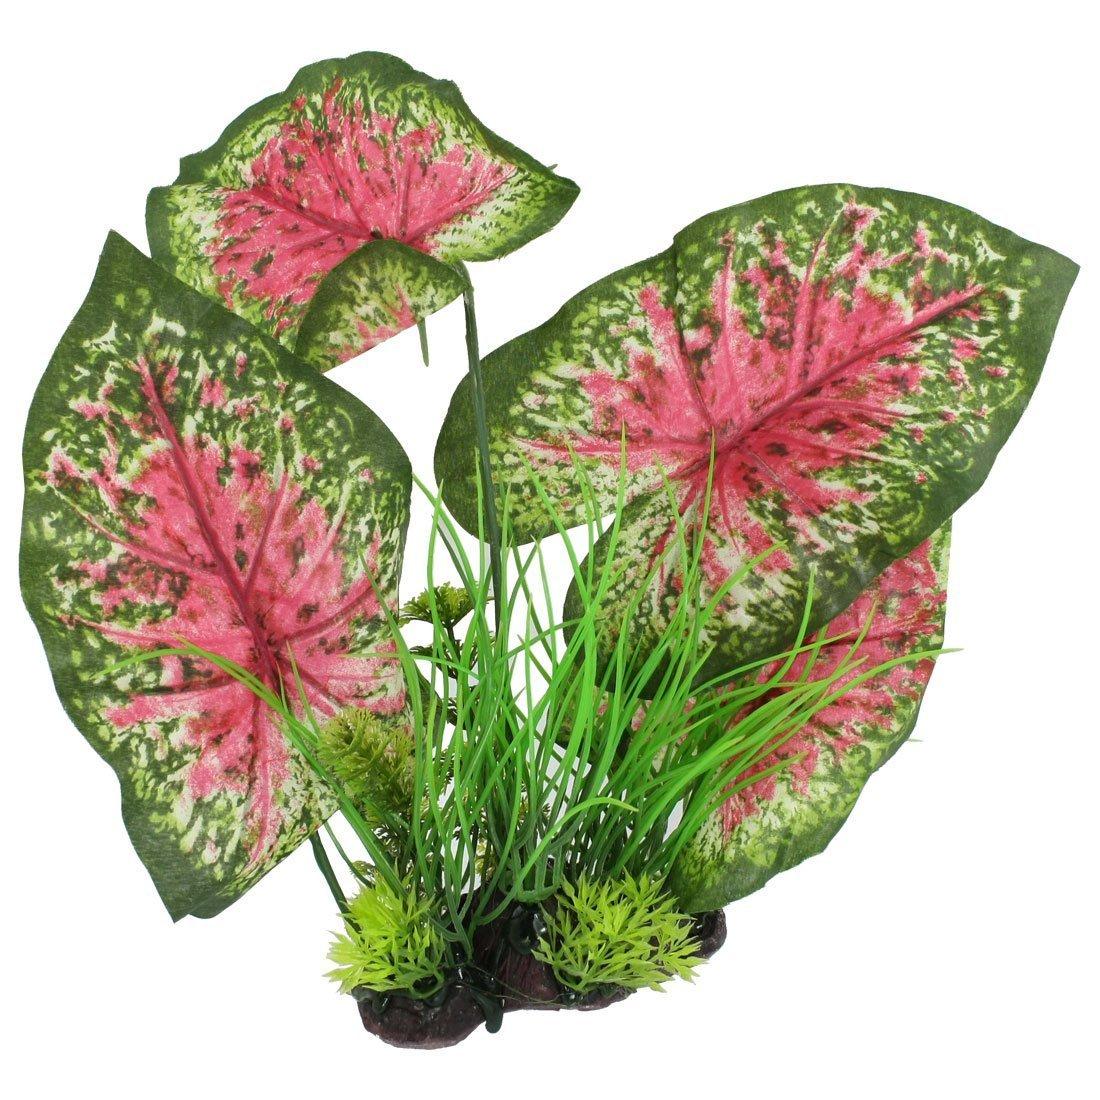 1Pc Plastic Fish Tank Manmade Grass Plant, Green Magenta